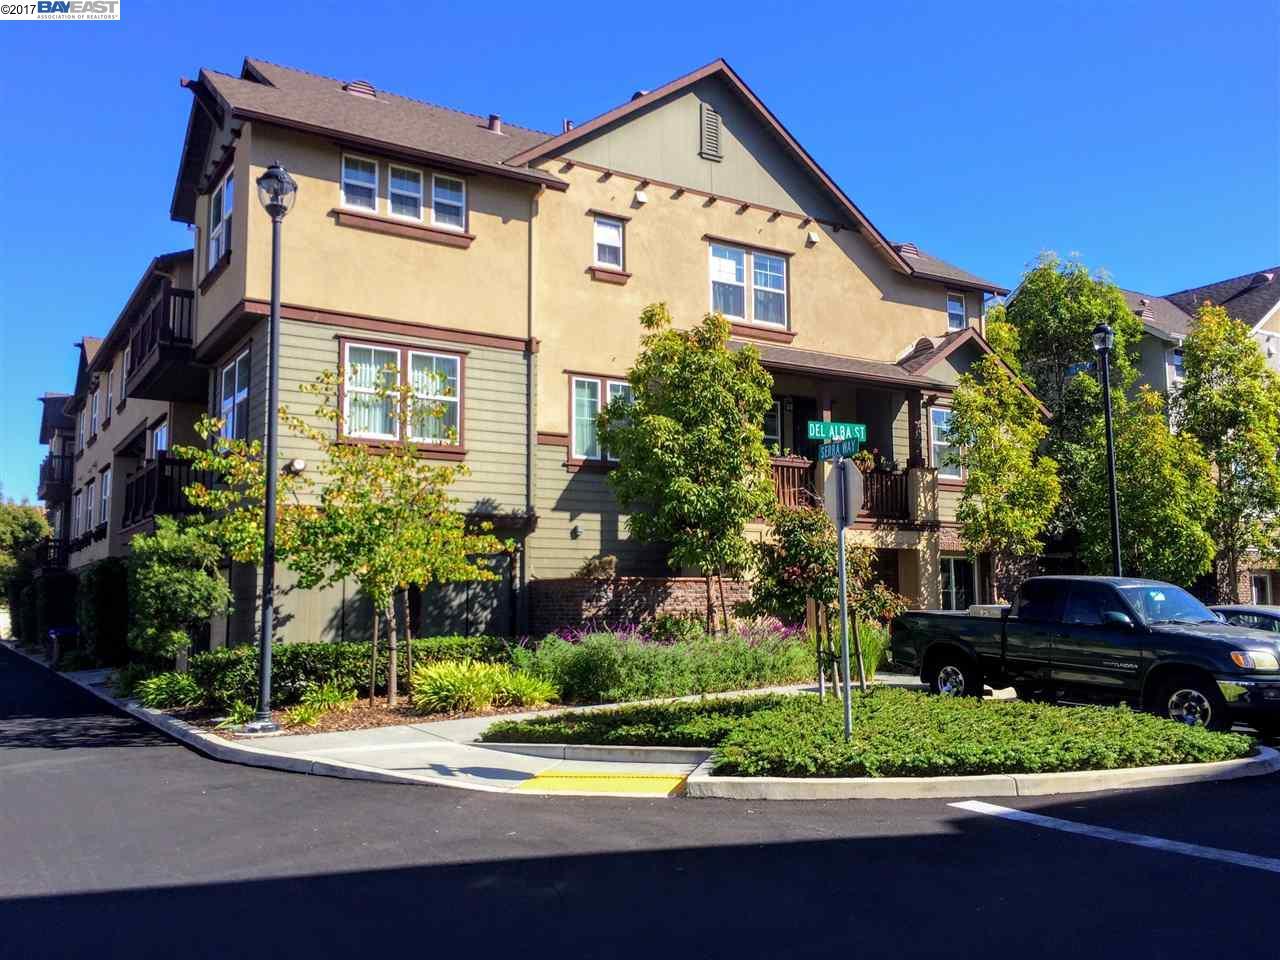 تاون هاوس للـ Sale في 104 Serra Way 104 Serra Way San Pablo, California 94806 United States